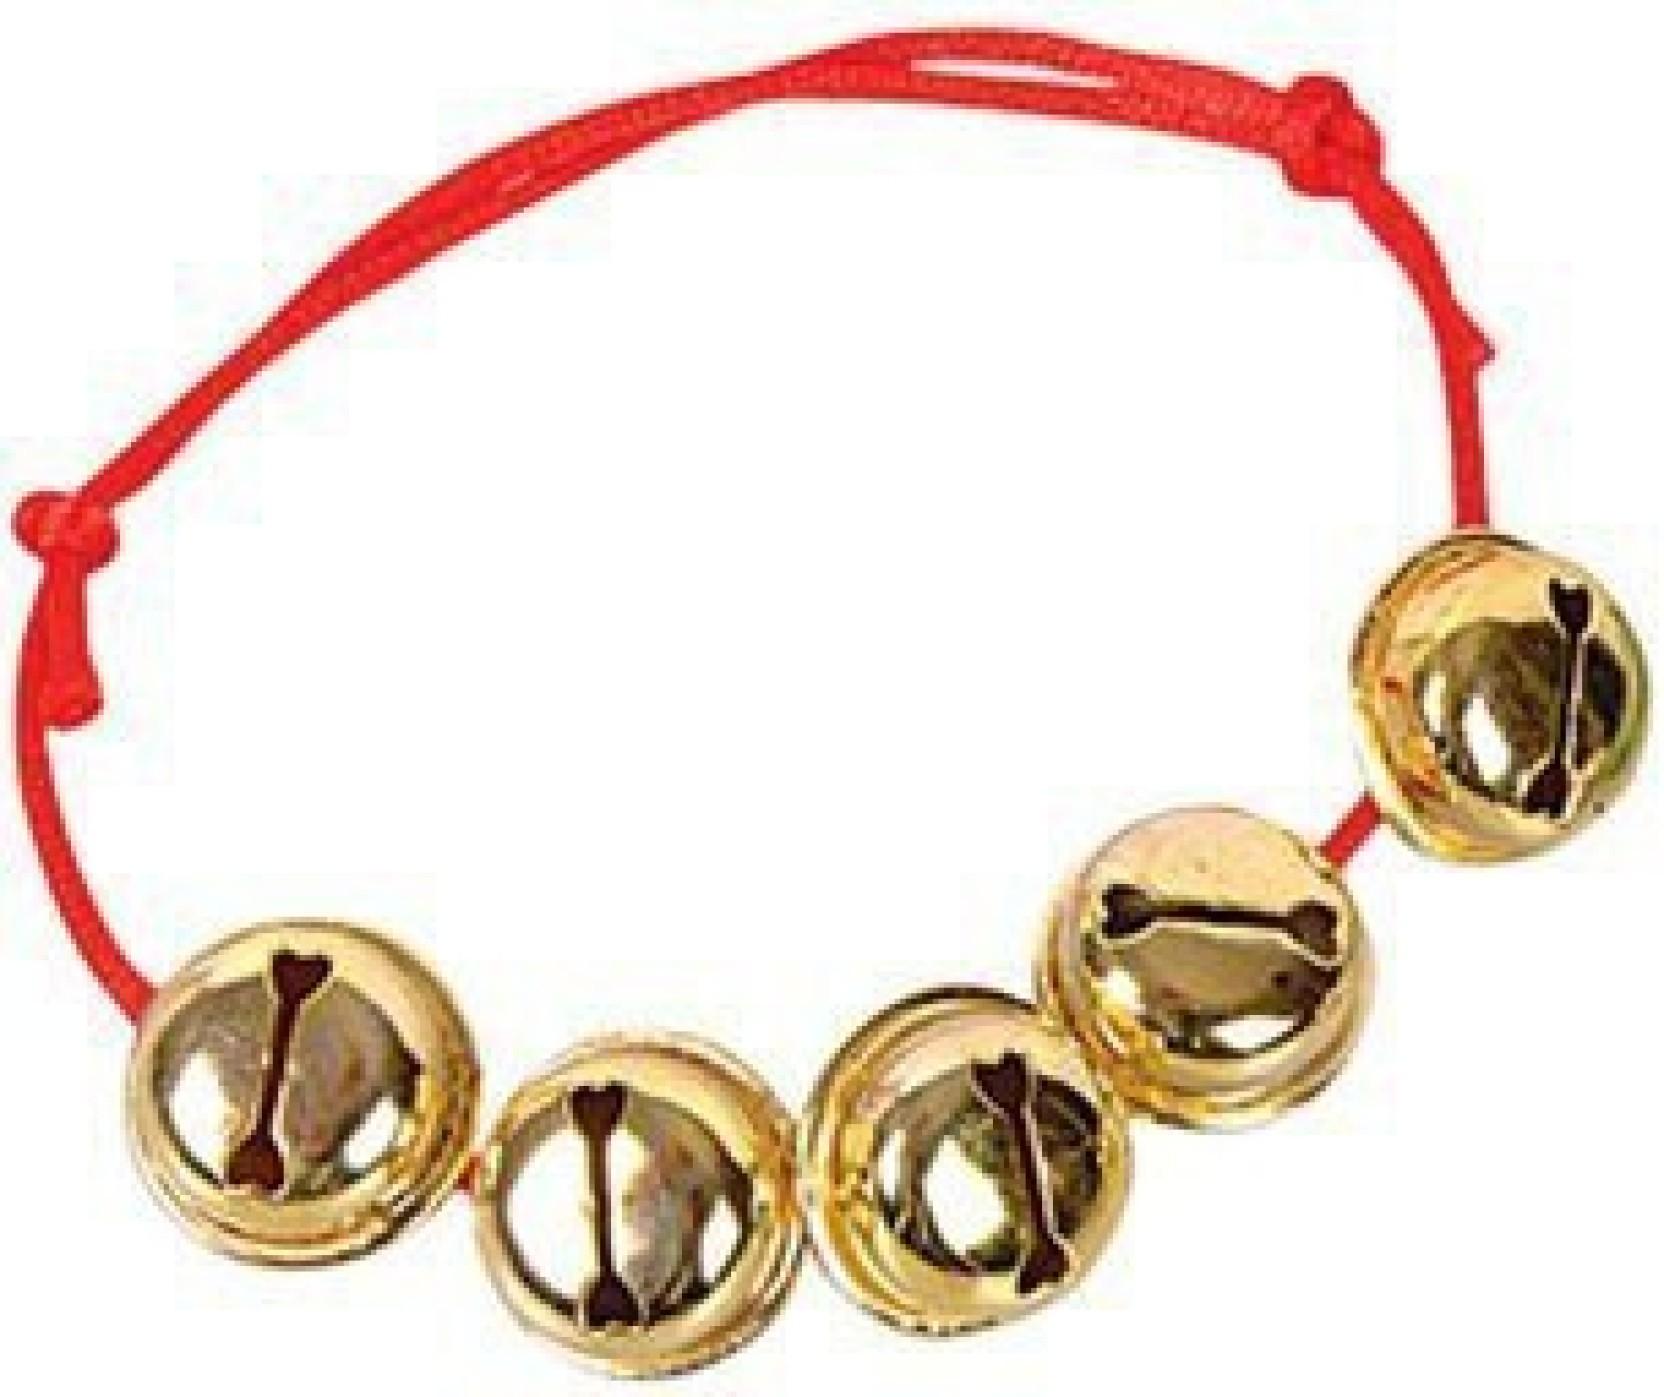 Generic Jingle Bell Bracelet - Christmas Bracelets With